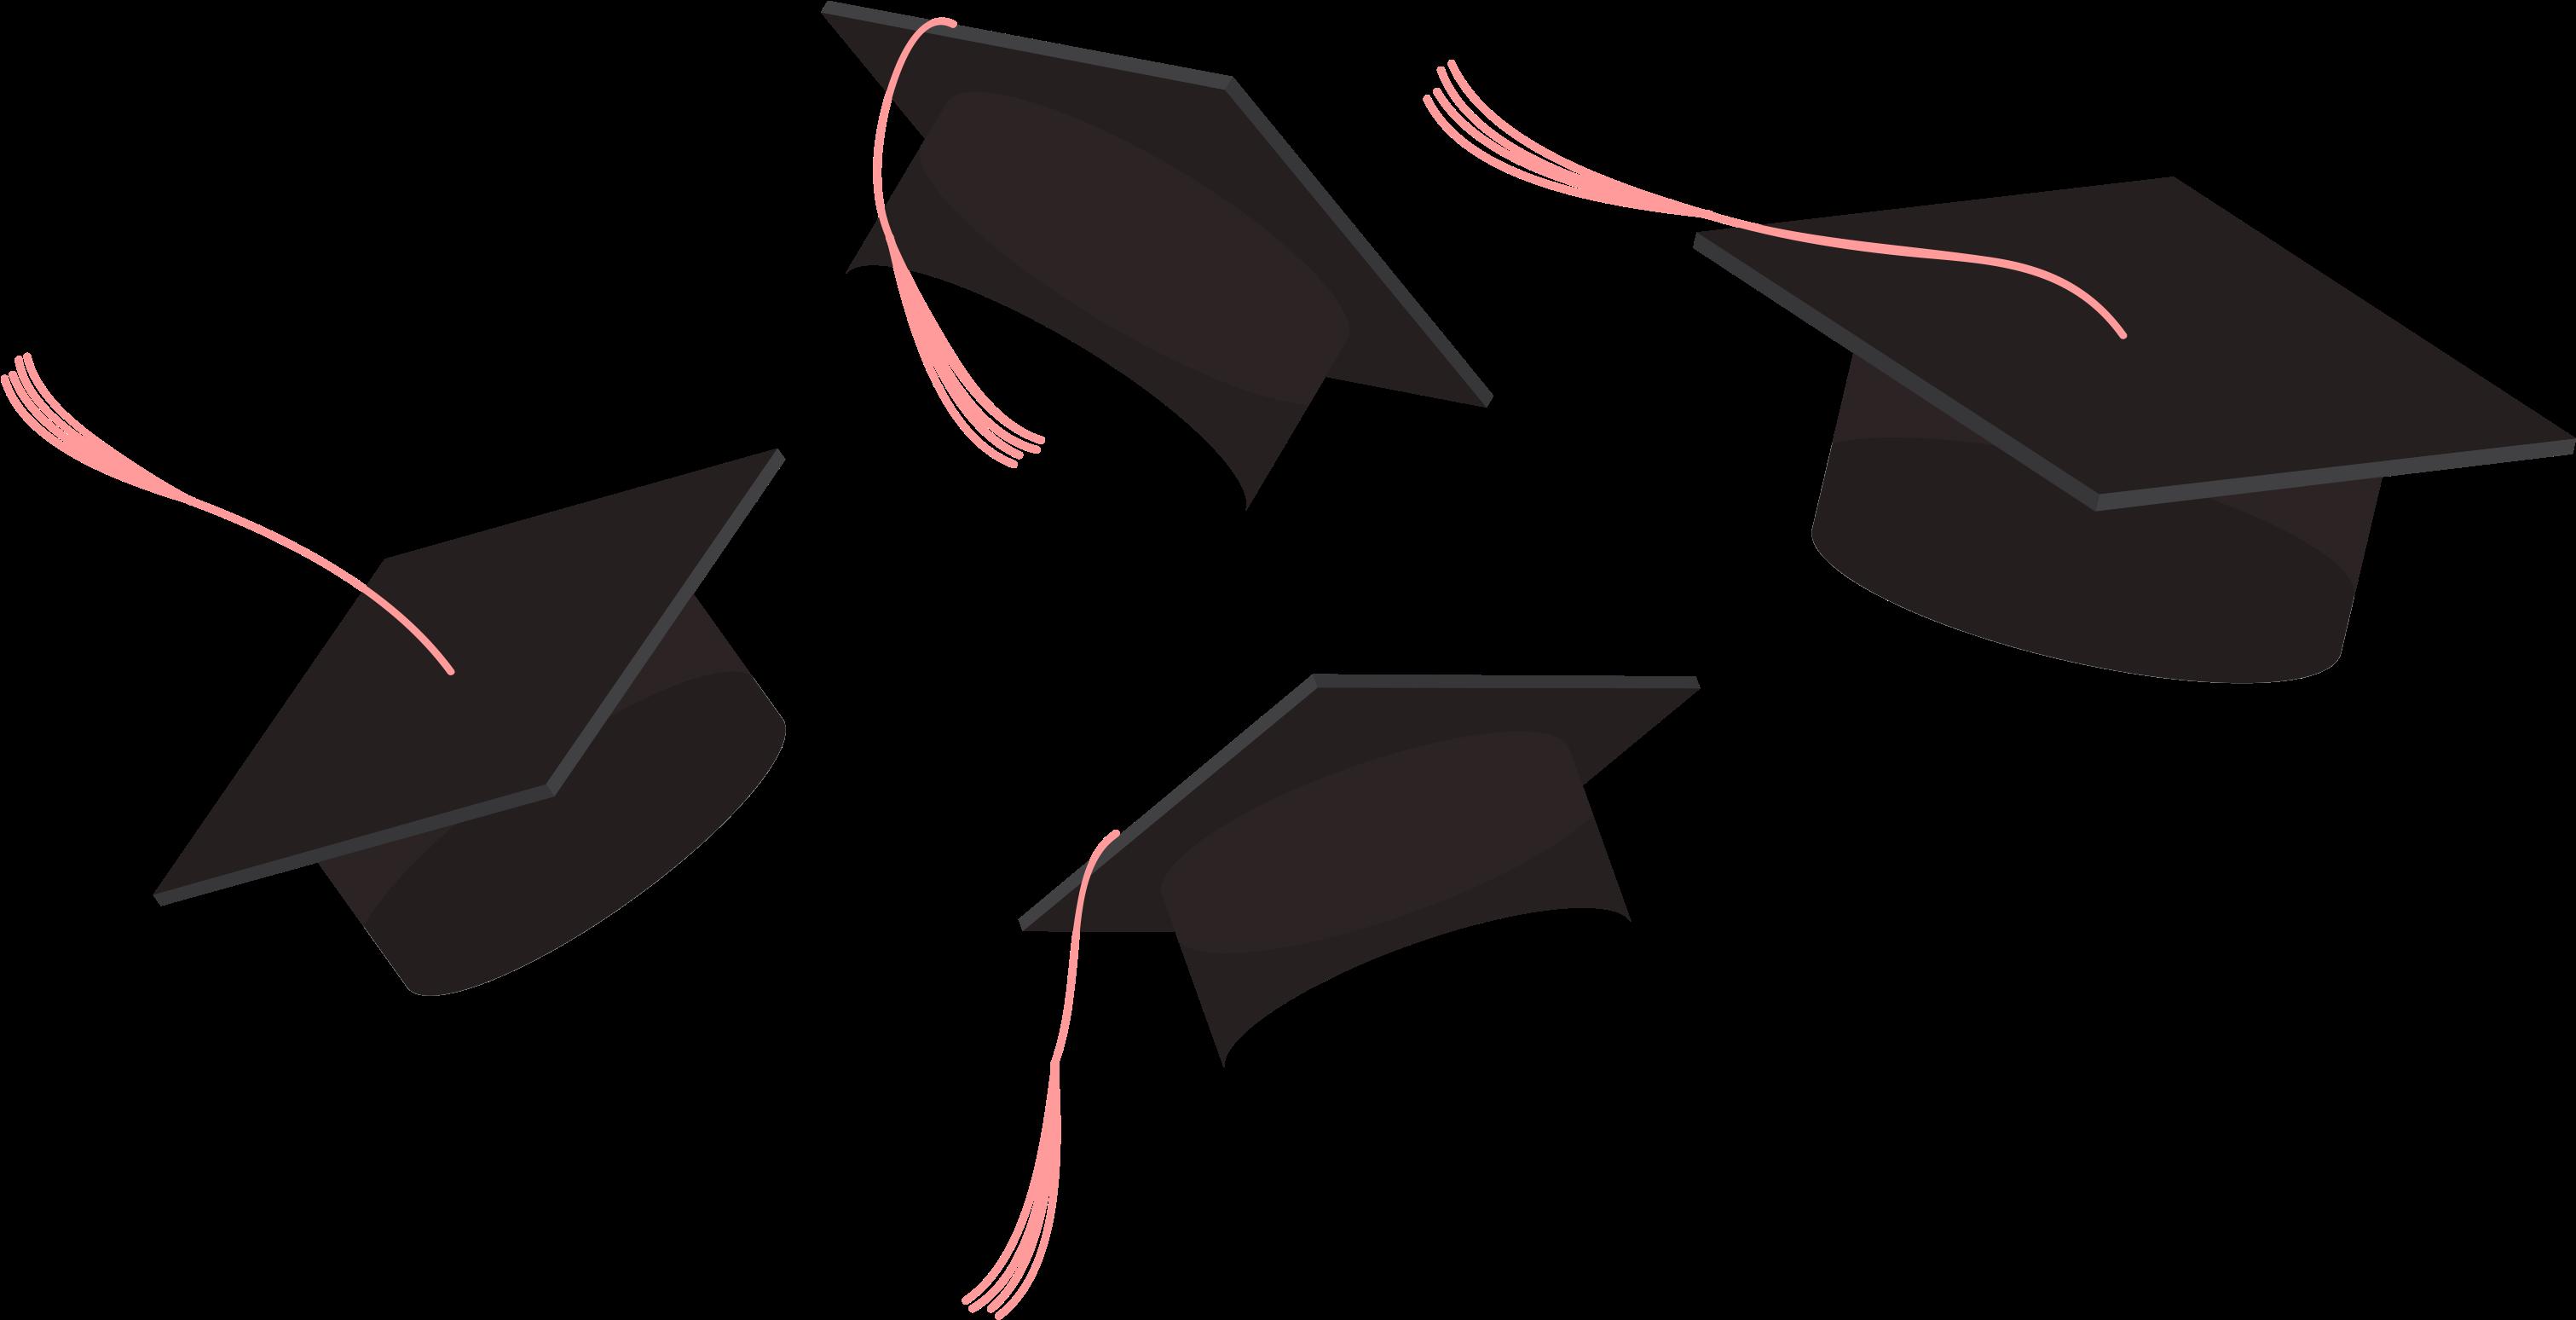 Download Png Graduation - Throwing Graduation Cap Png PNG ...